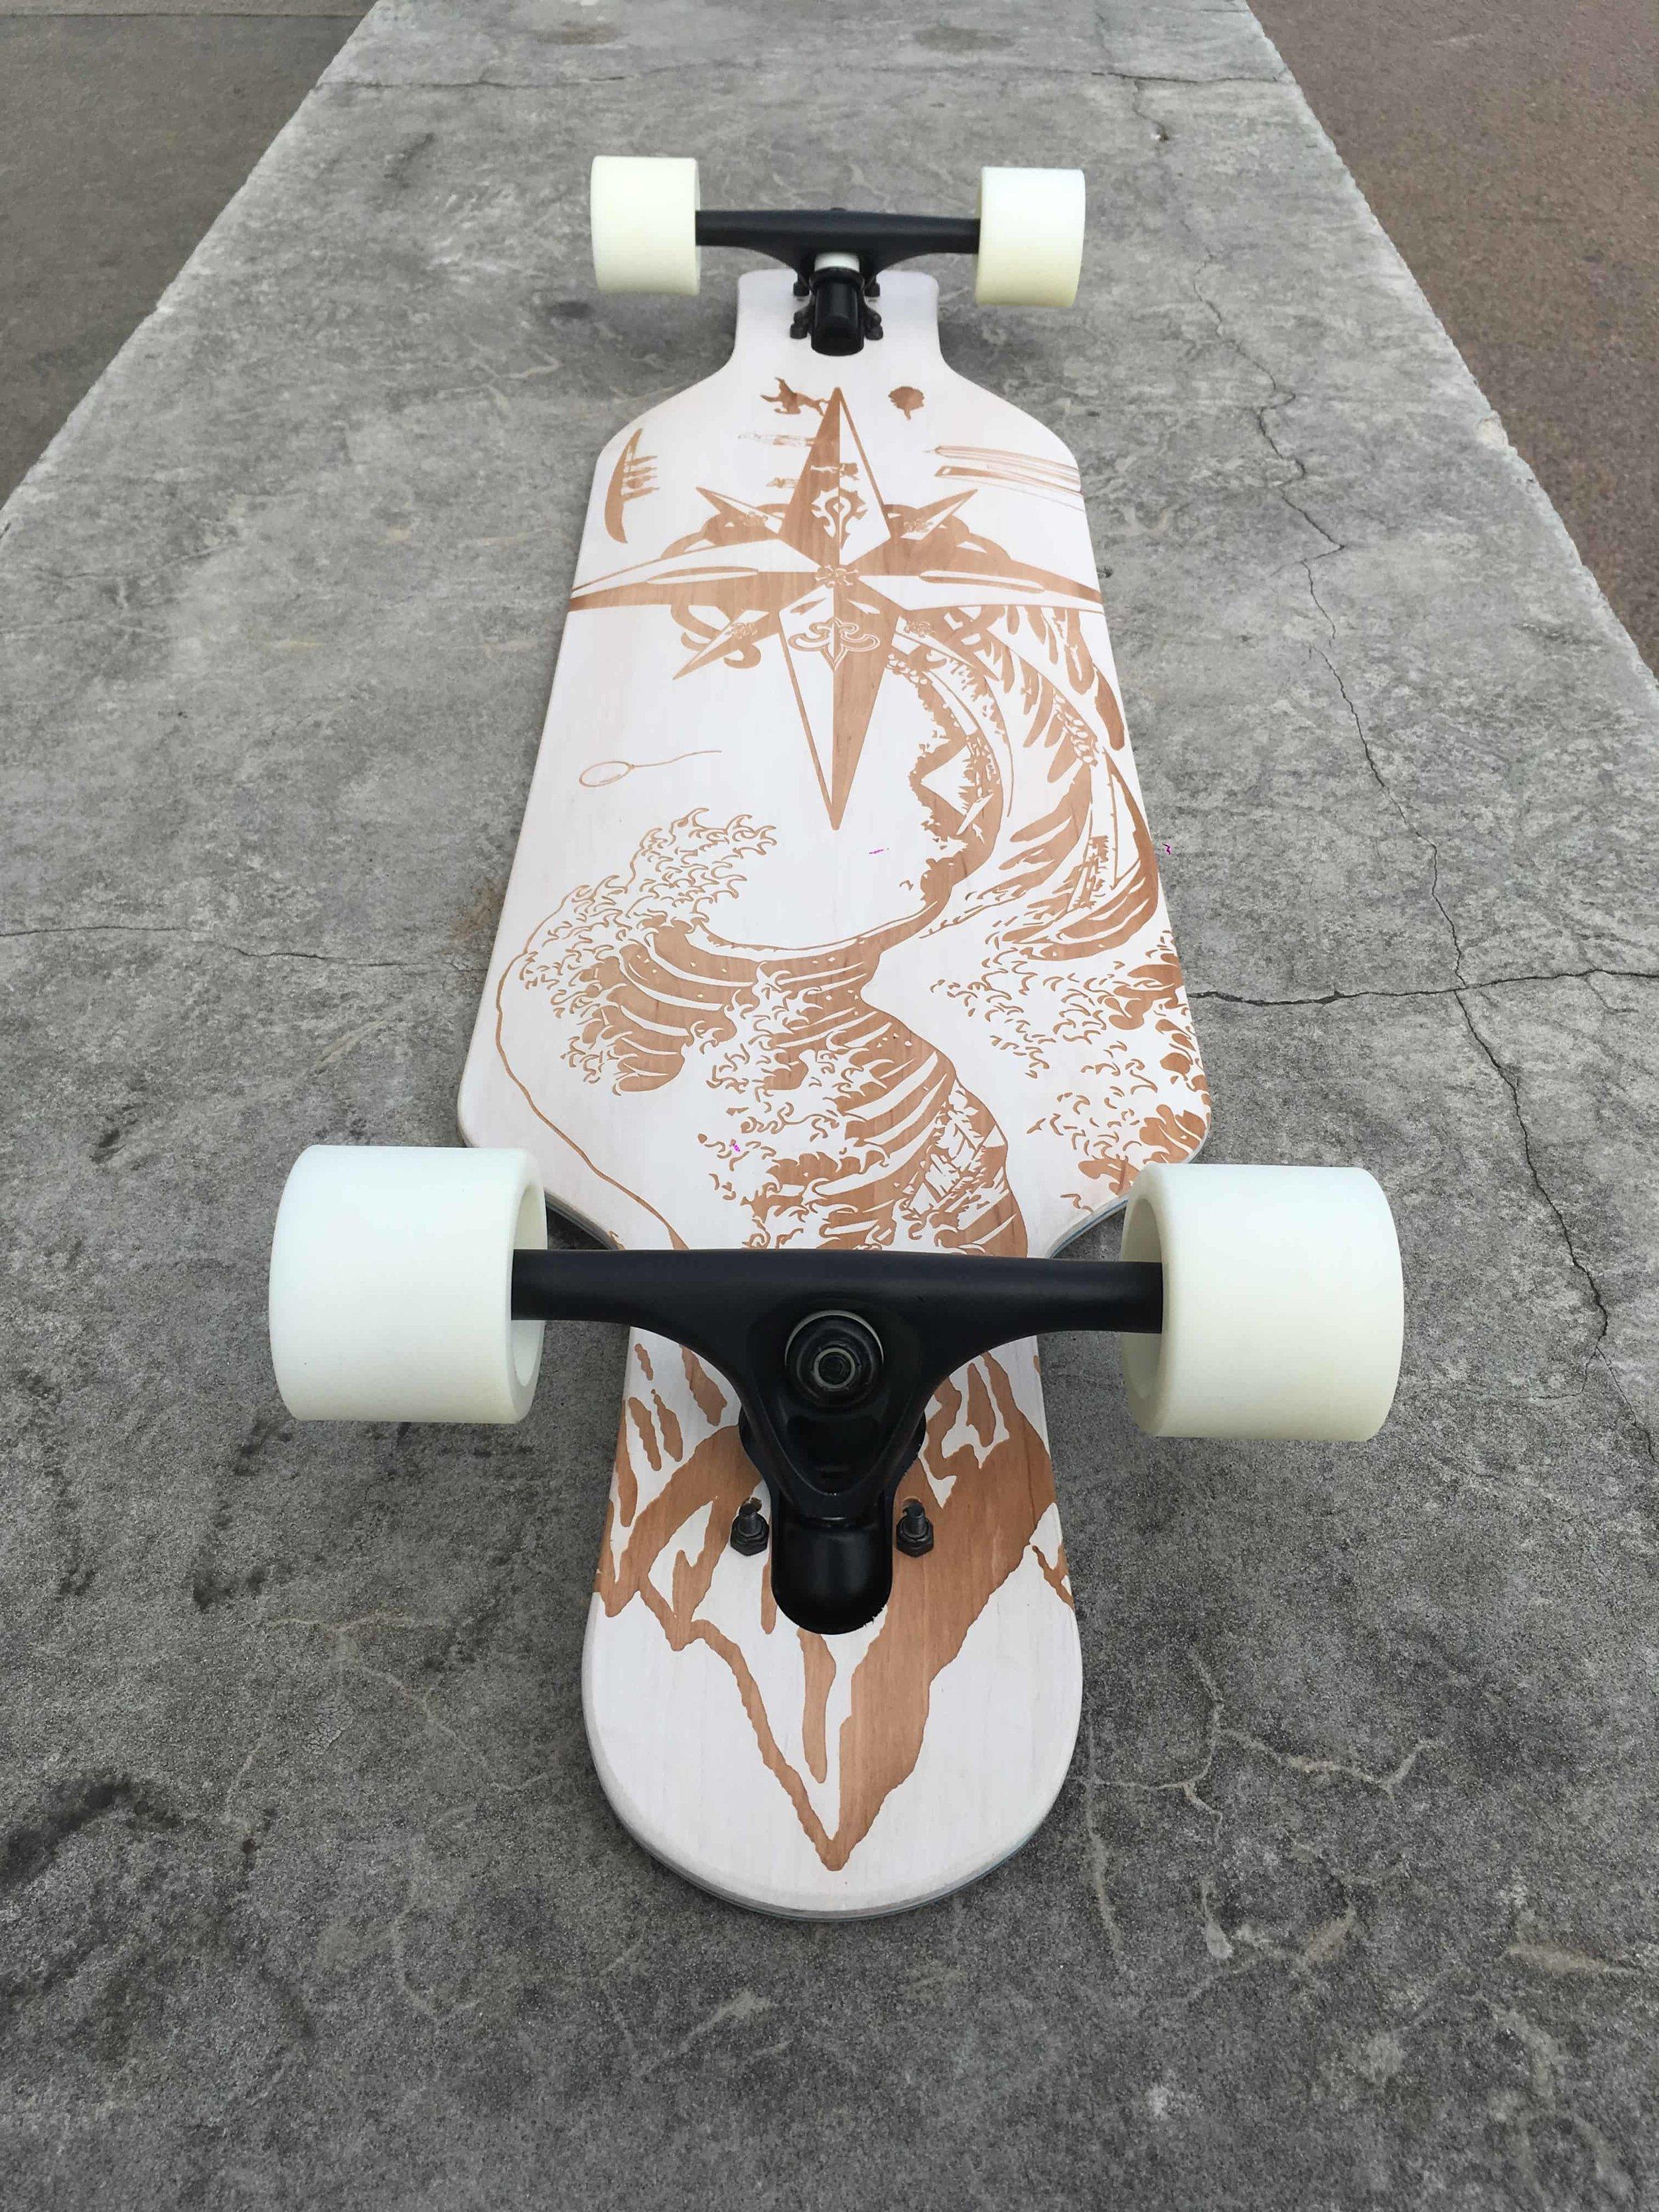 Vincent's custom gift — Le Shape